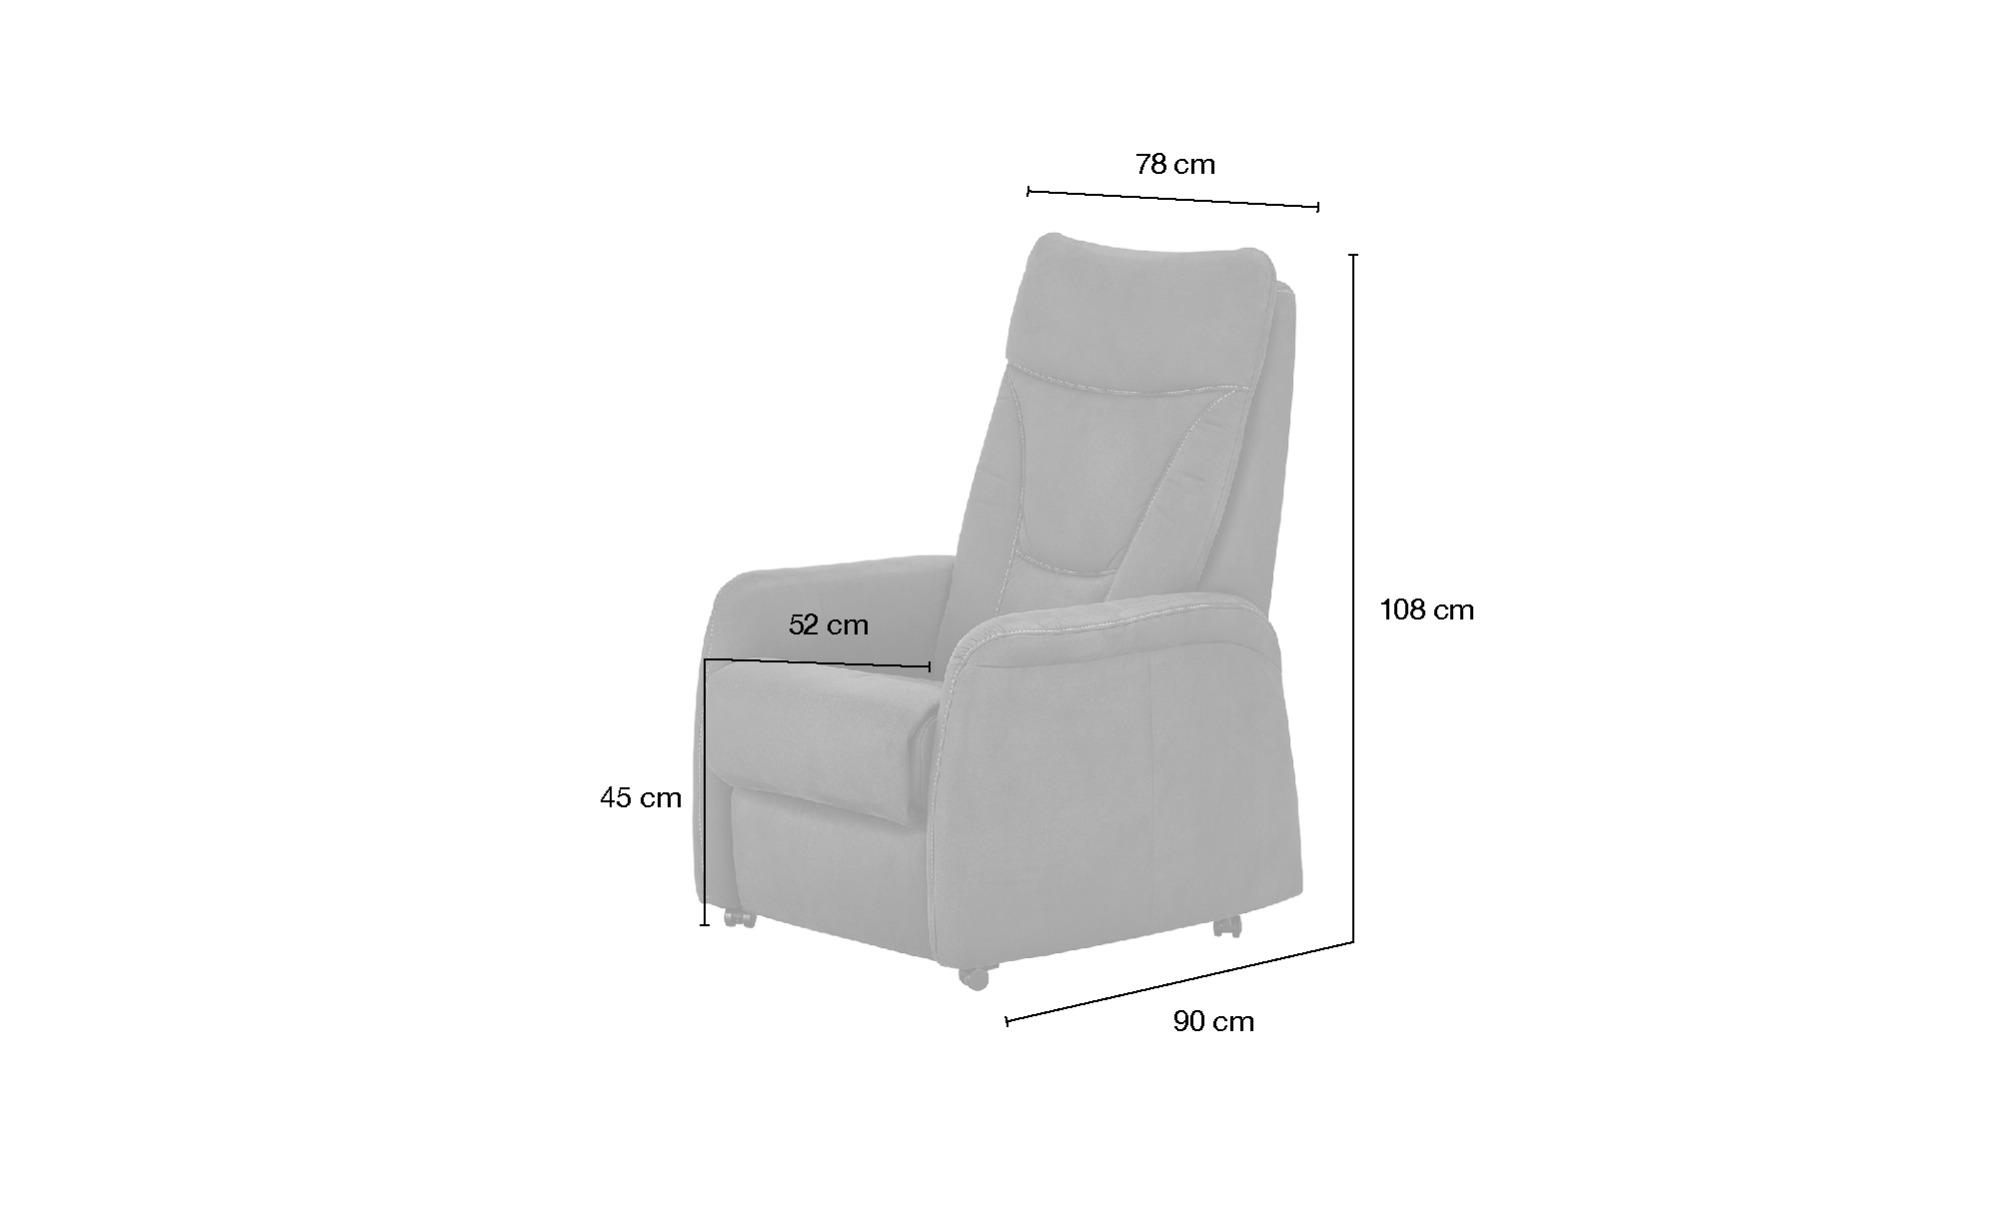 Hukla Fernsehsessel  Manuel ¦ braun ¦ Maße (cm): B: 78 H: 108 T: 90 Polstermöbel > Sessel > Polstersessel - Höffner